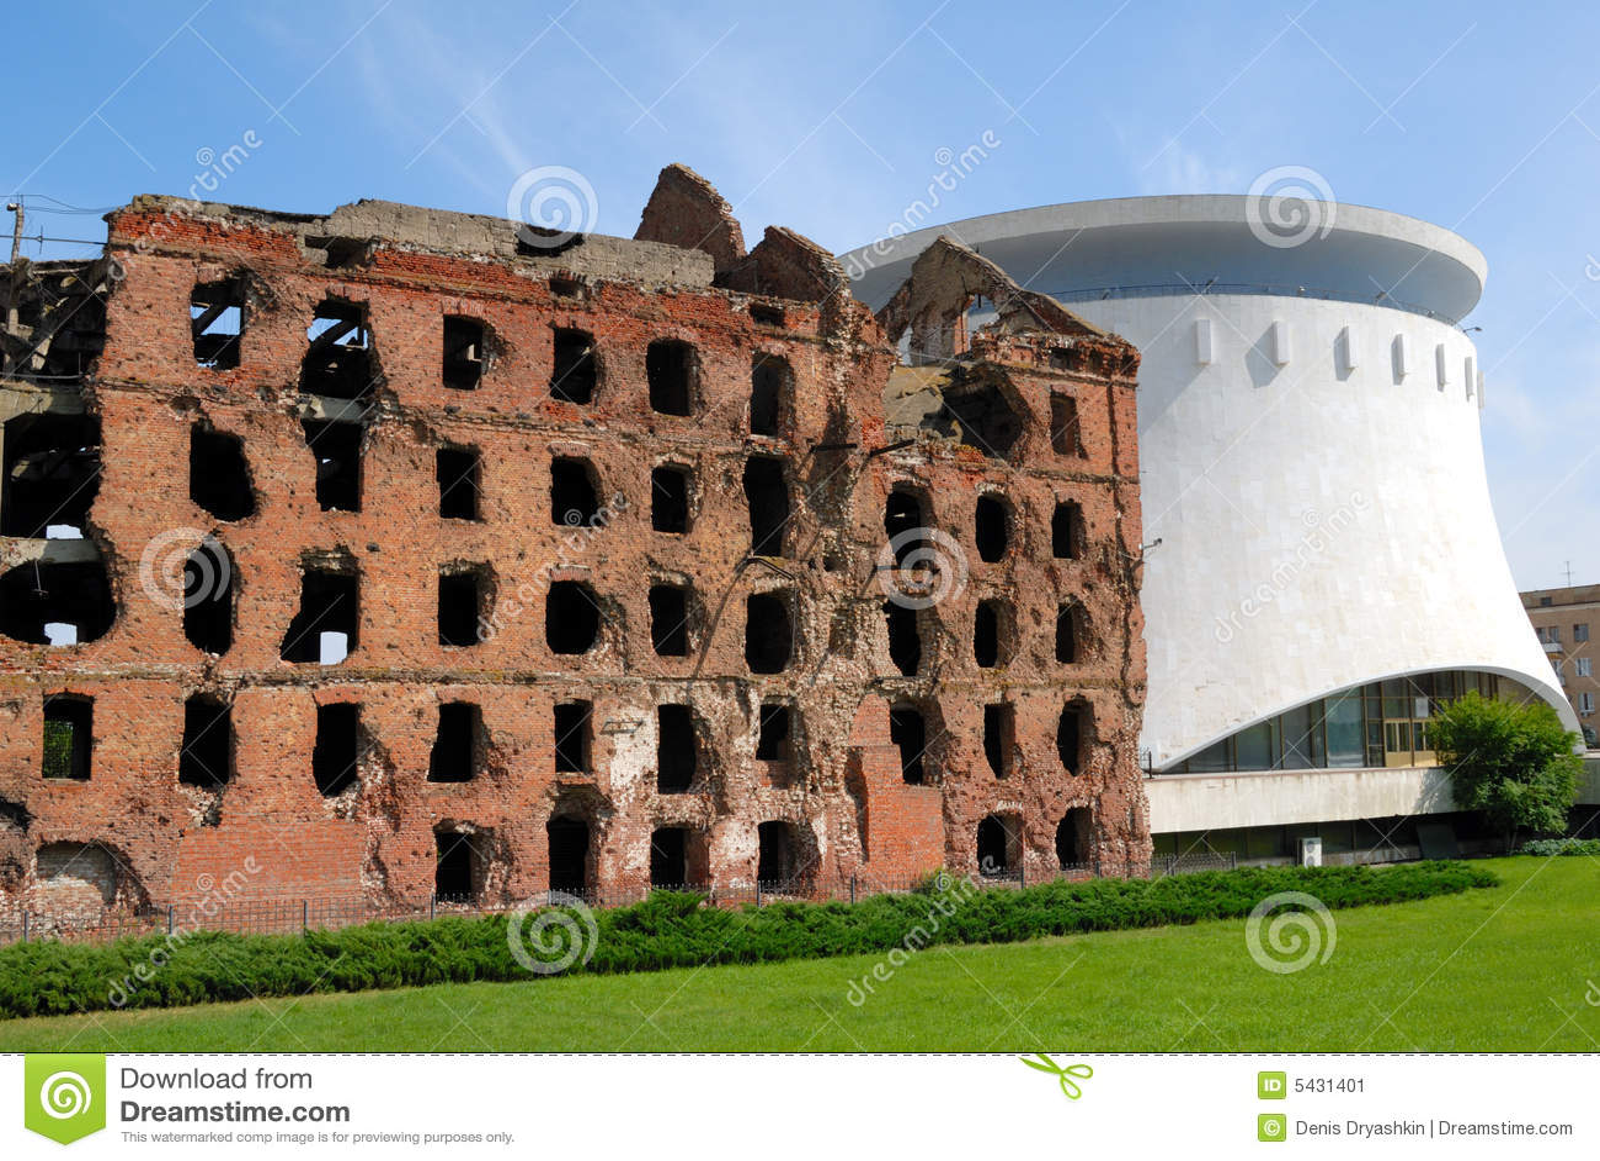 Museumspanorama Stalingrad Kampf zerstörtes Tausendstel Wolgagrad